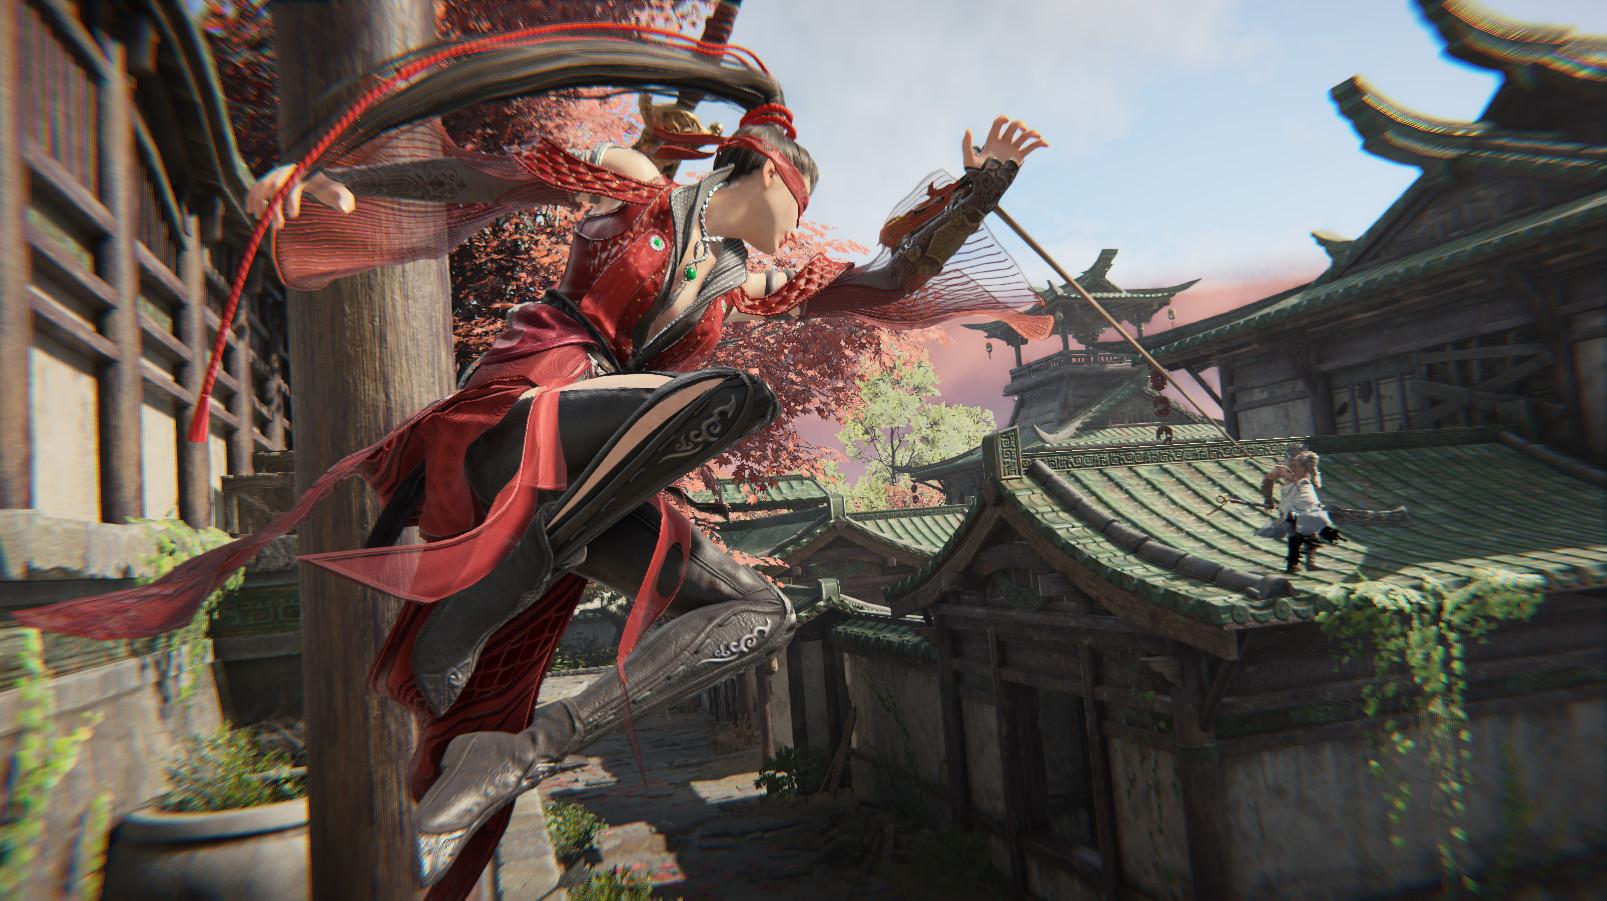 Naraka: Bladepoint เกม Battle Royales น้องใหม่สไตล์ ดาบ-ธนู เตรียมเปิดรอบ Beta ปลายสัปดาห์นี้